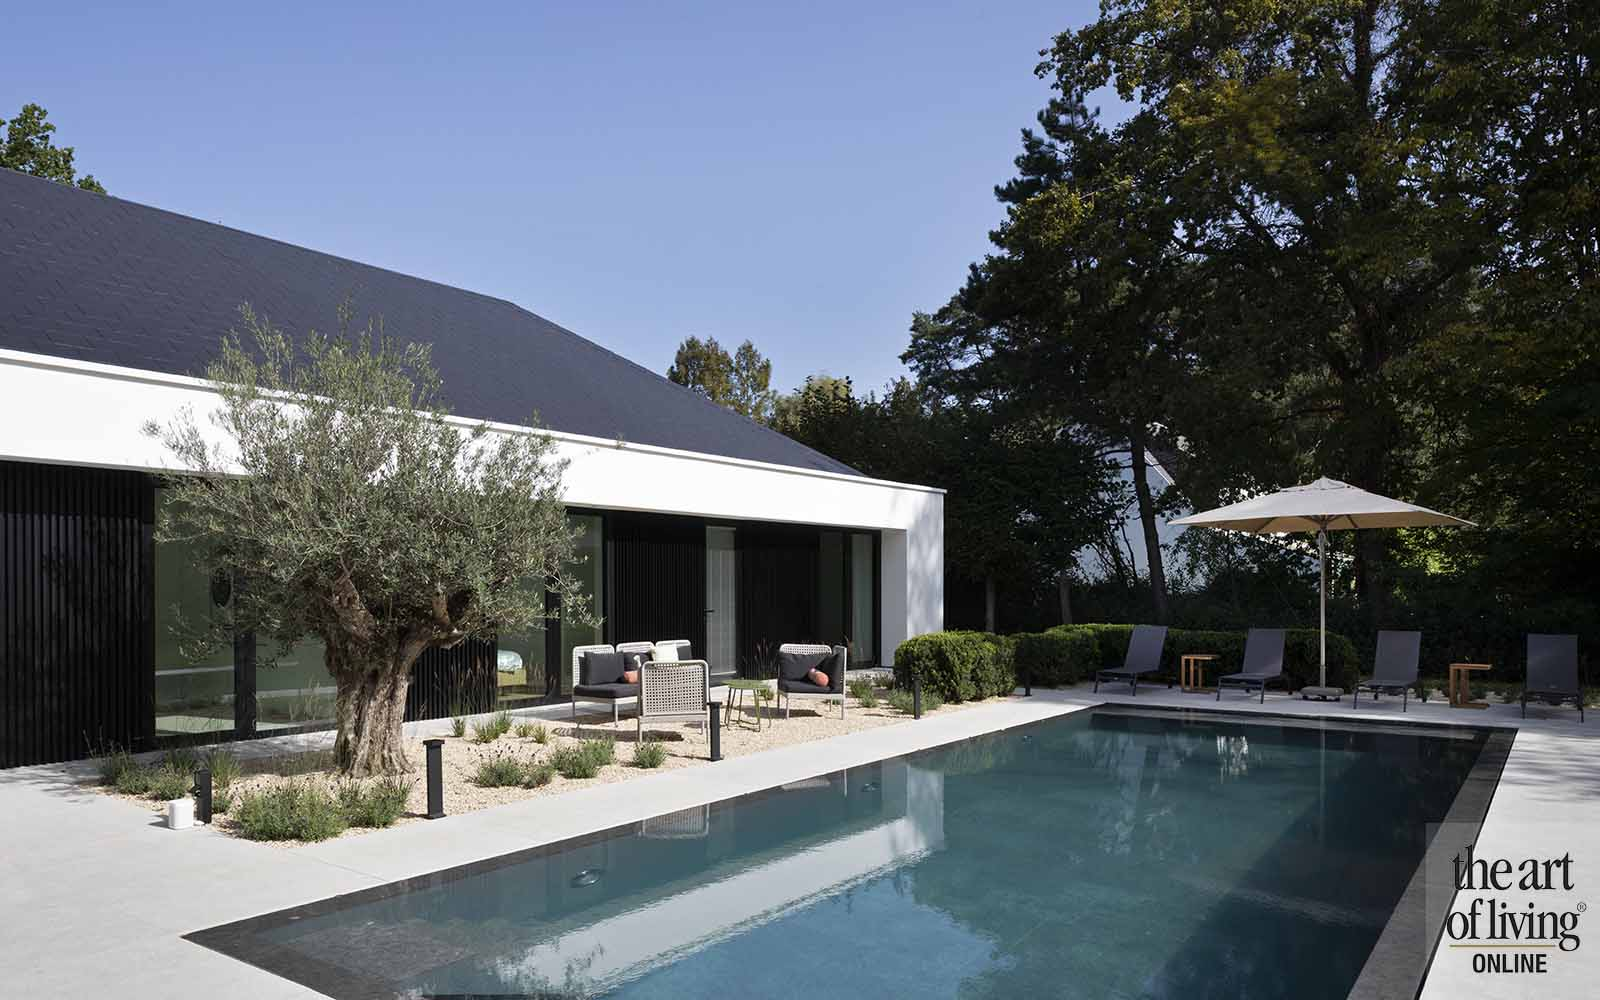 Ibiza stijl | buro 2018, the art of living